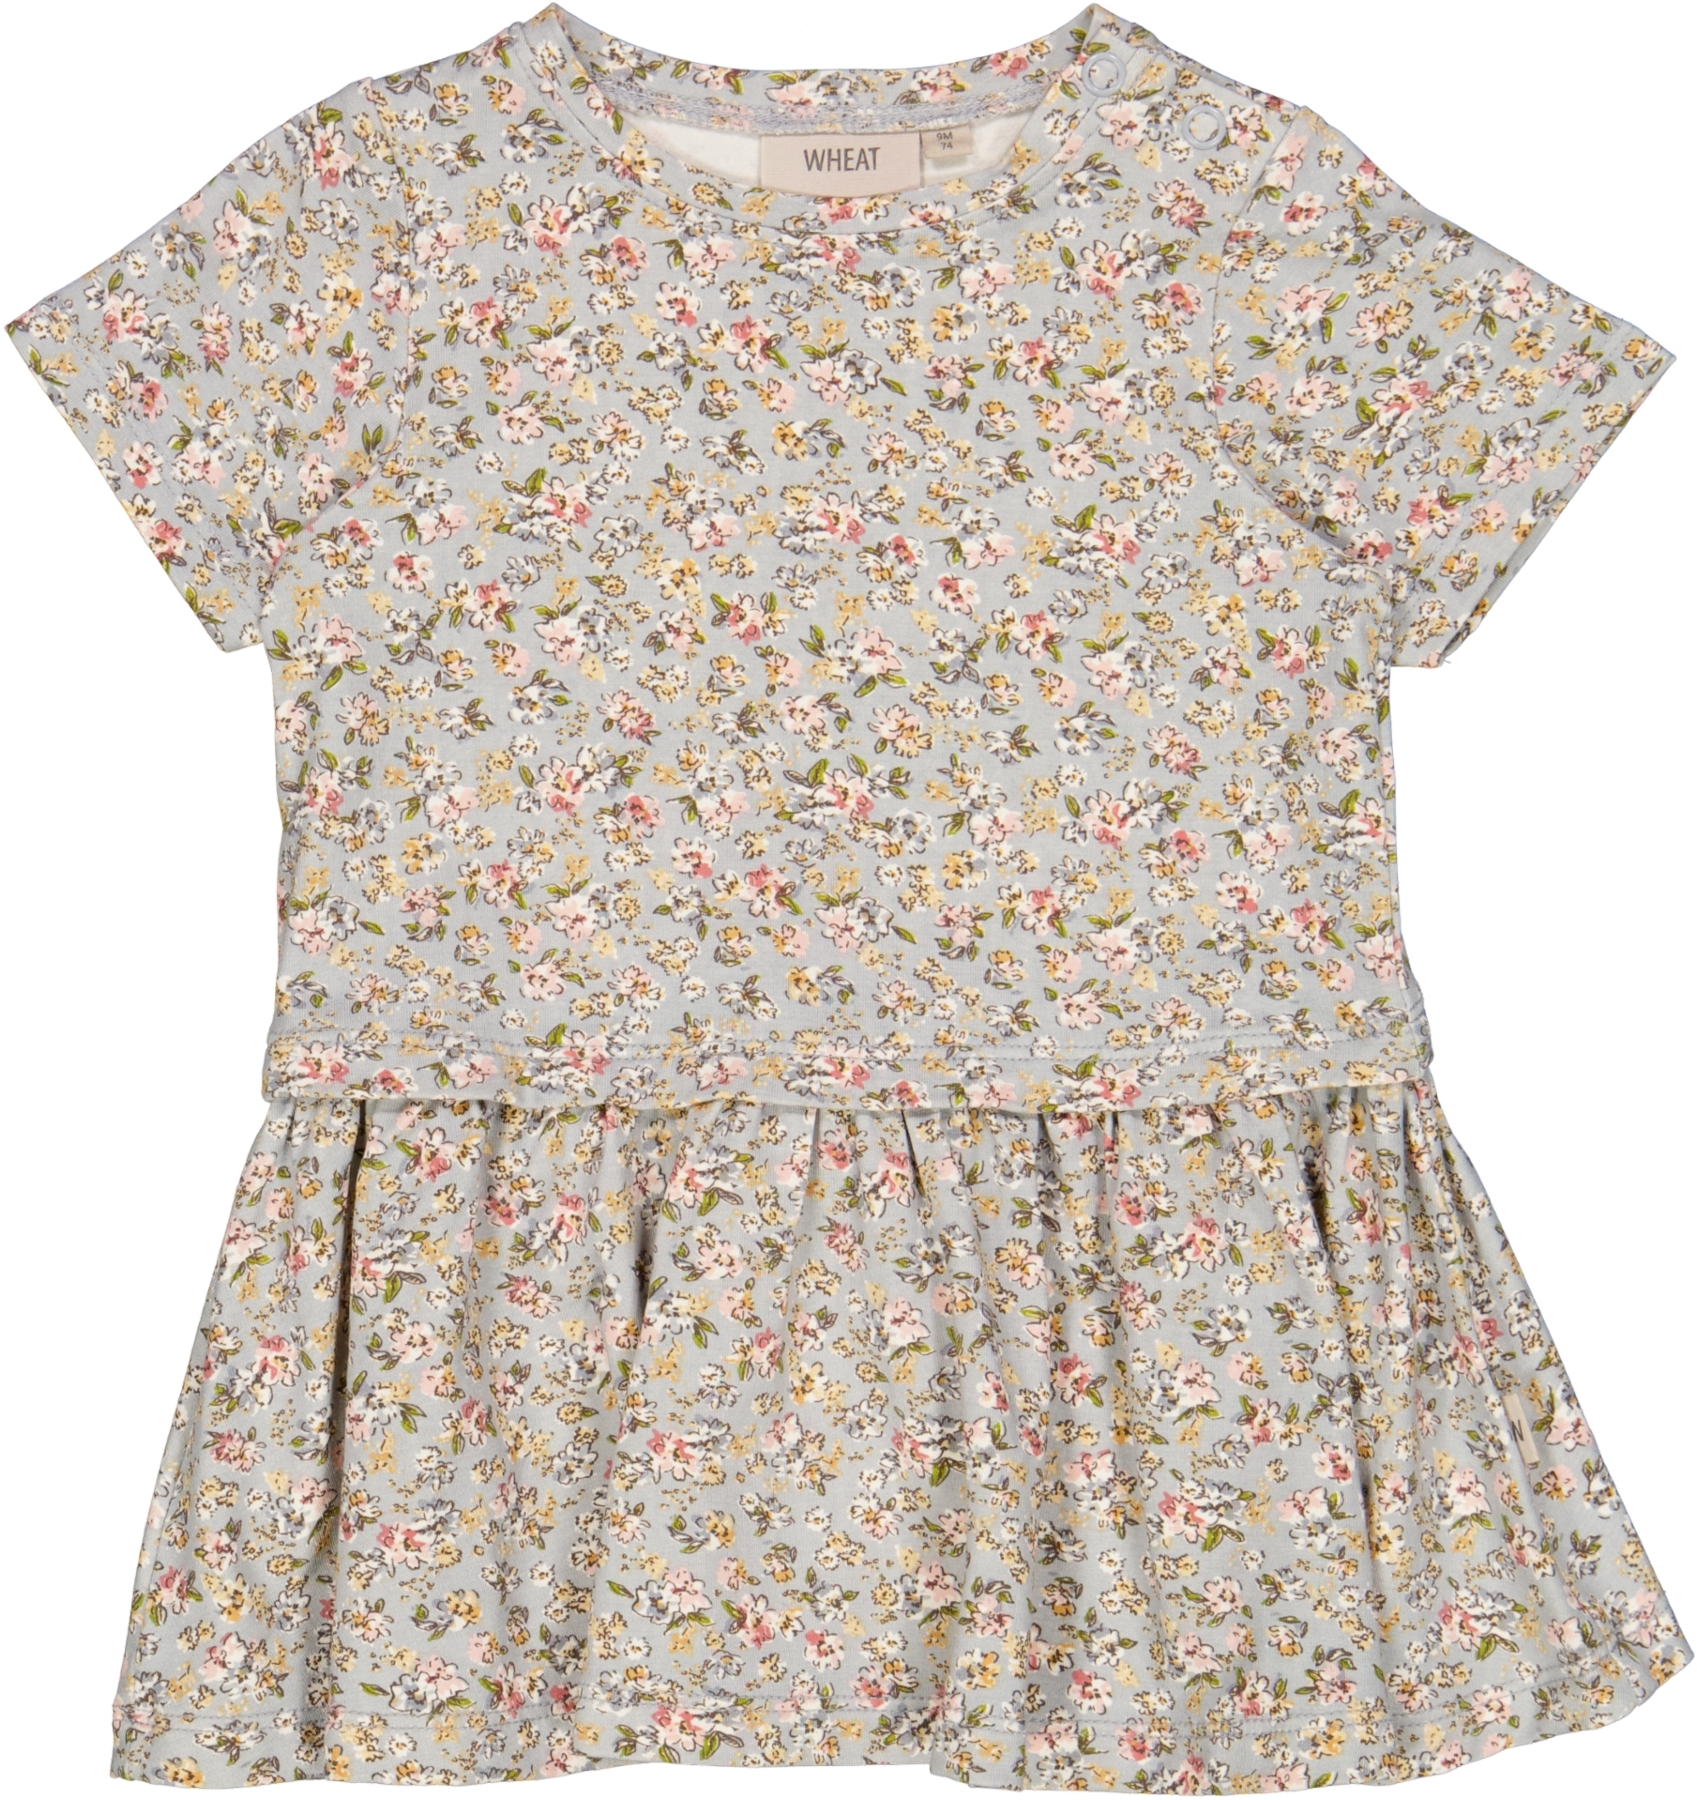 Wheat Adea kjole